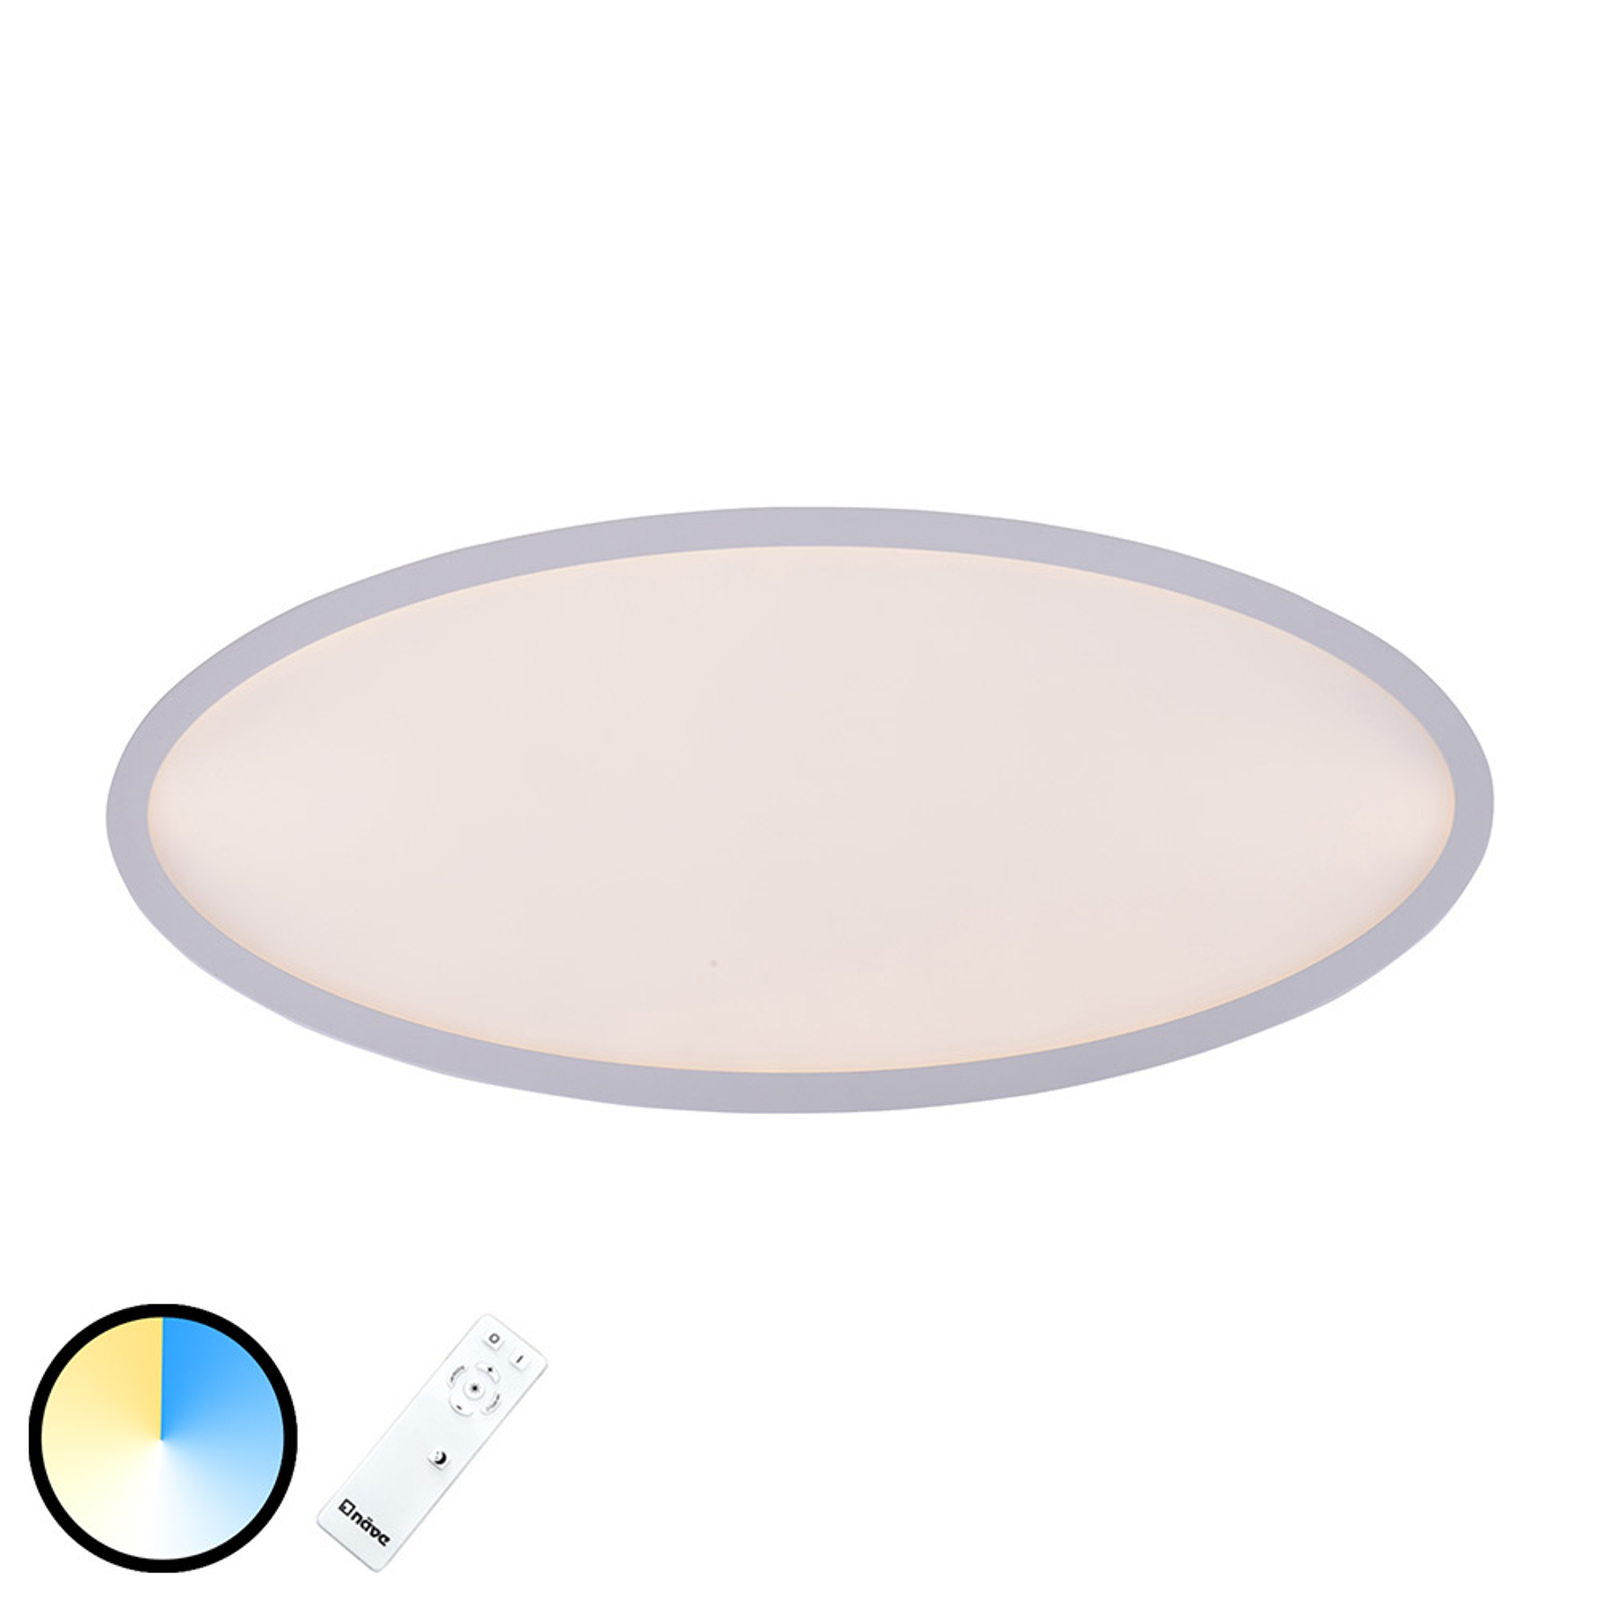 Lampa sufitowa LED Pesaro owalna 80 cm x 35 cm